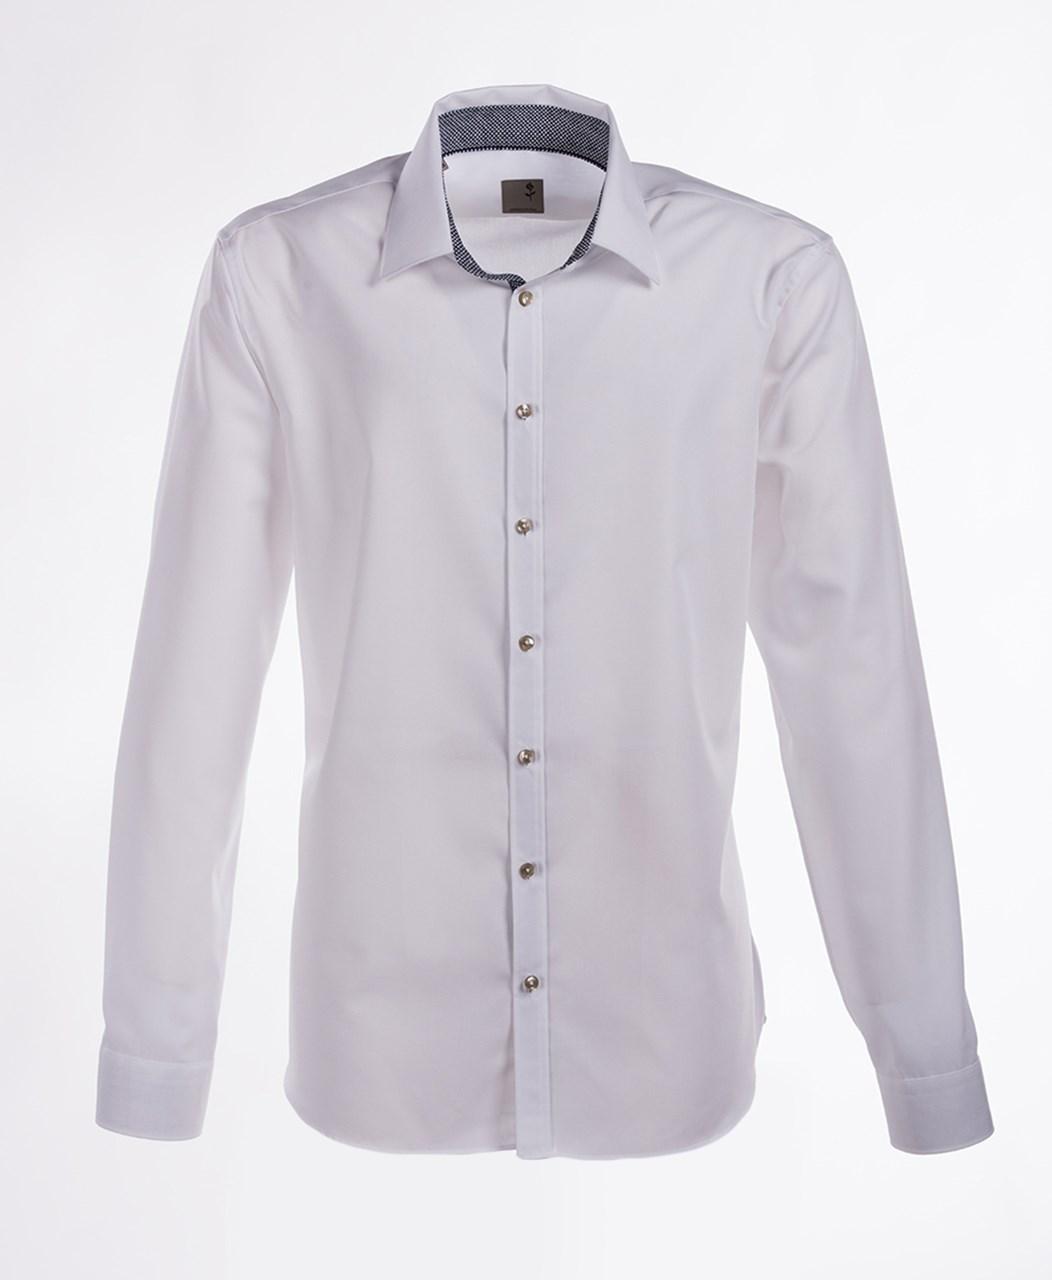 W M EGO. Bílá pánská košile SEIDENSTICKER 2c8754ce8e